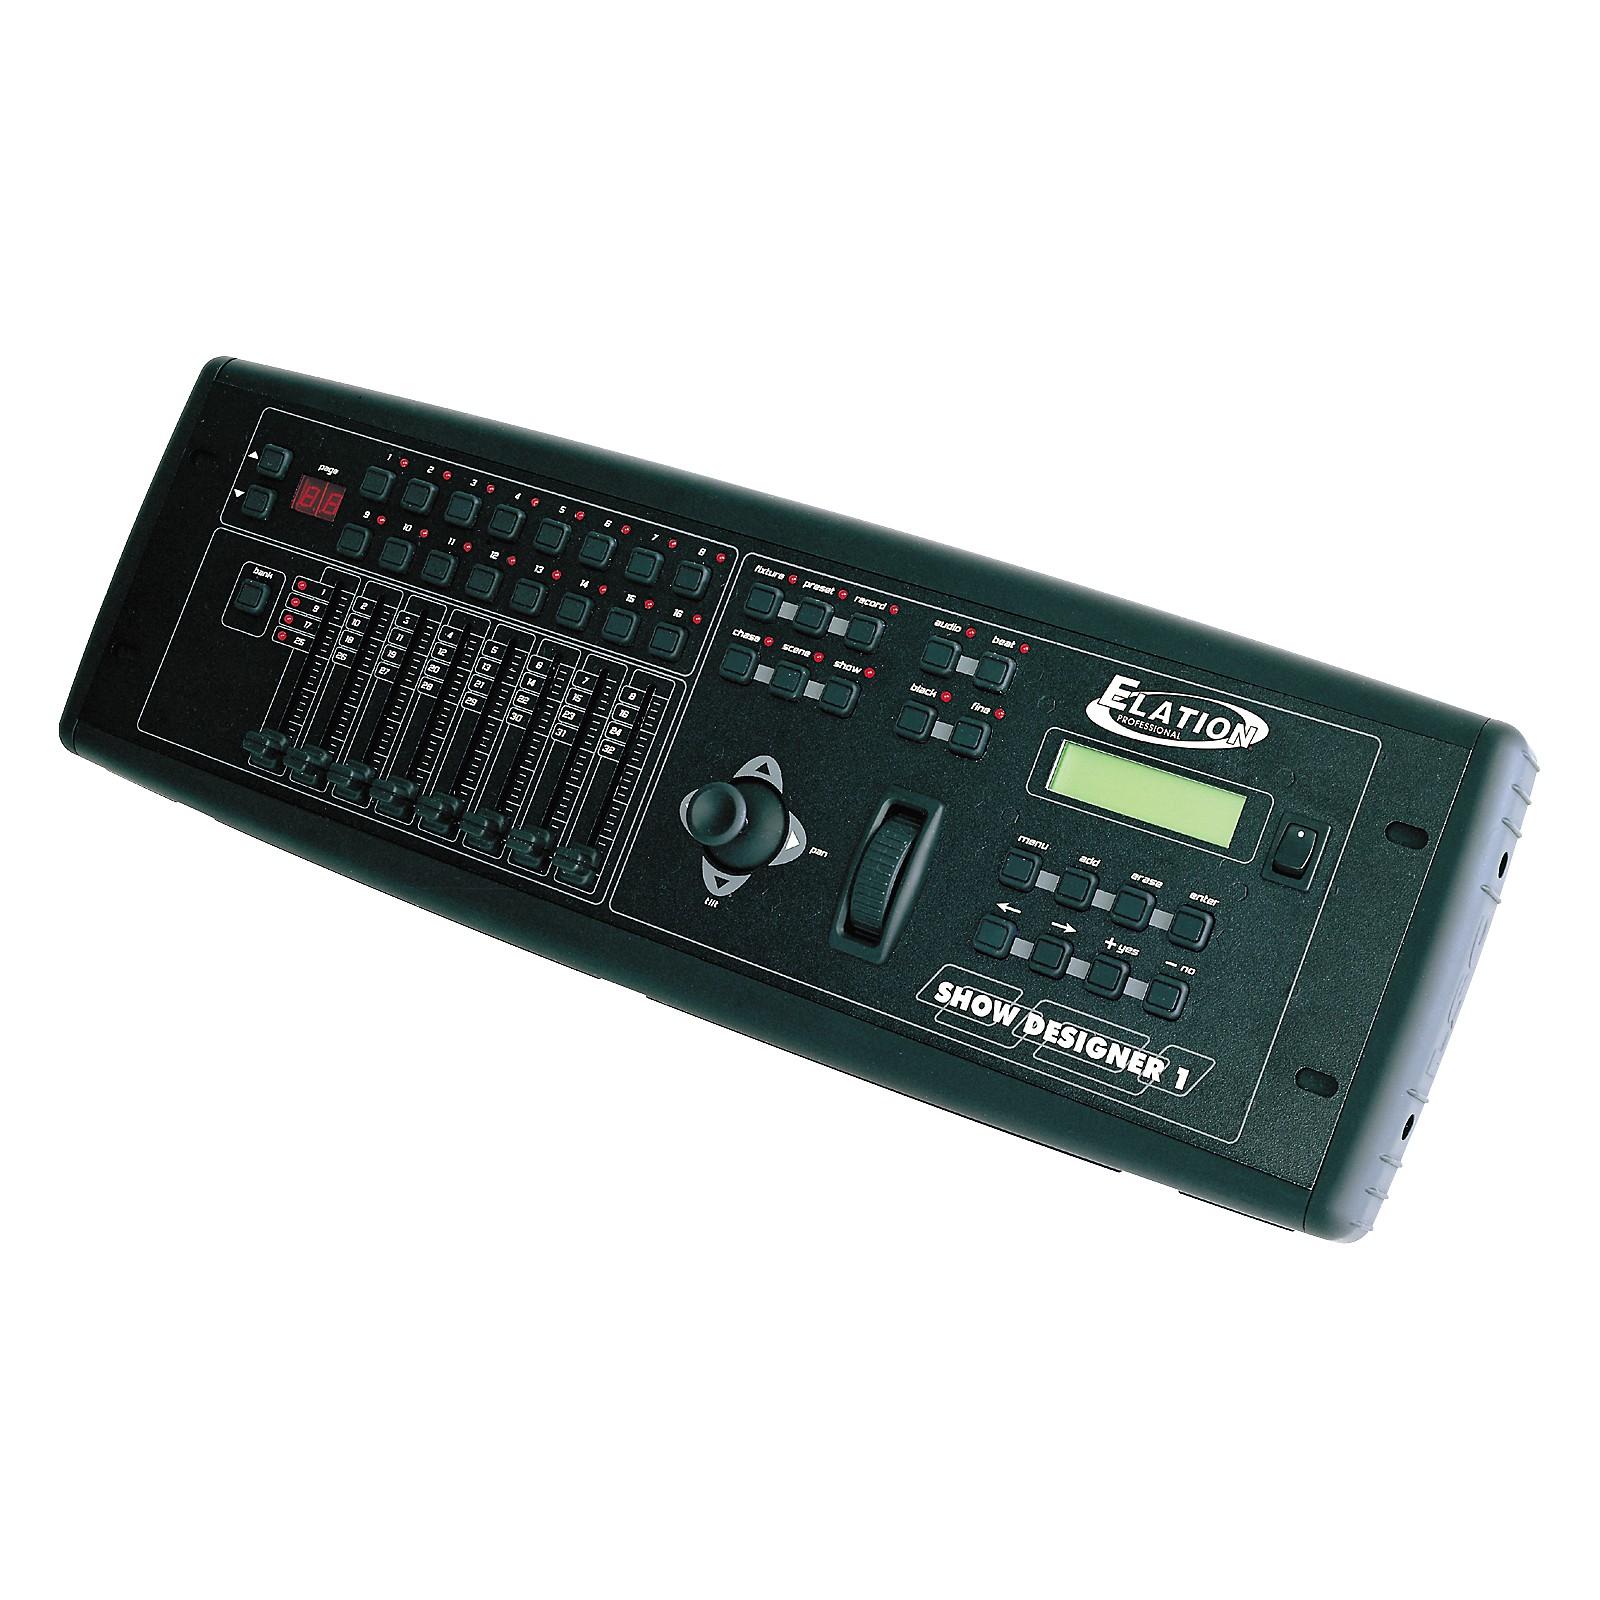 Elation Show Designer DMX512 Controller